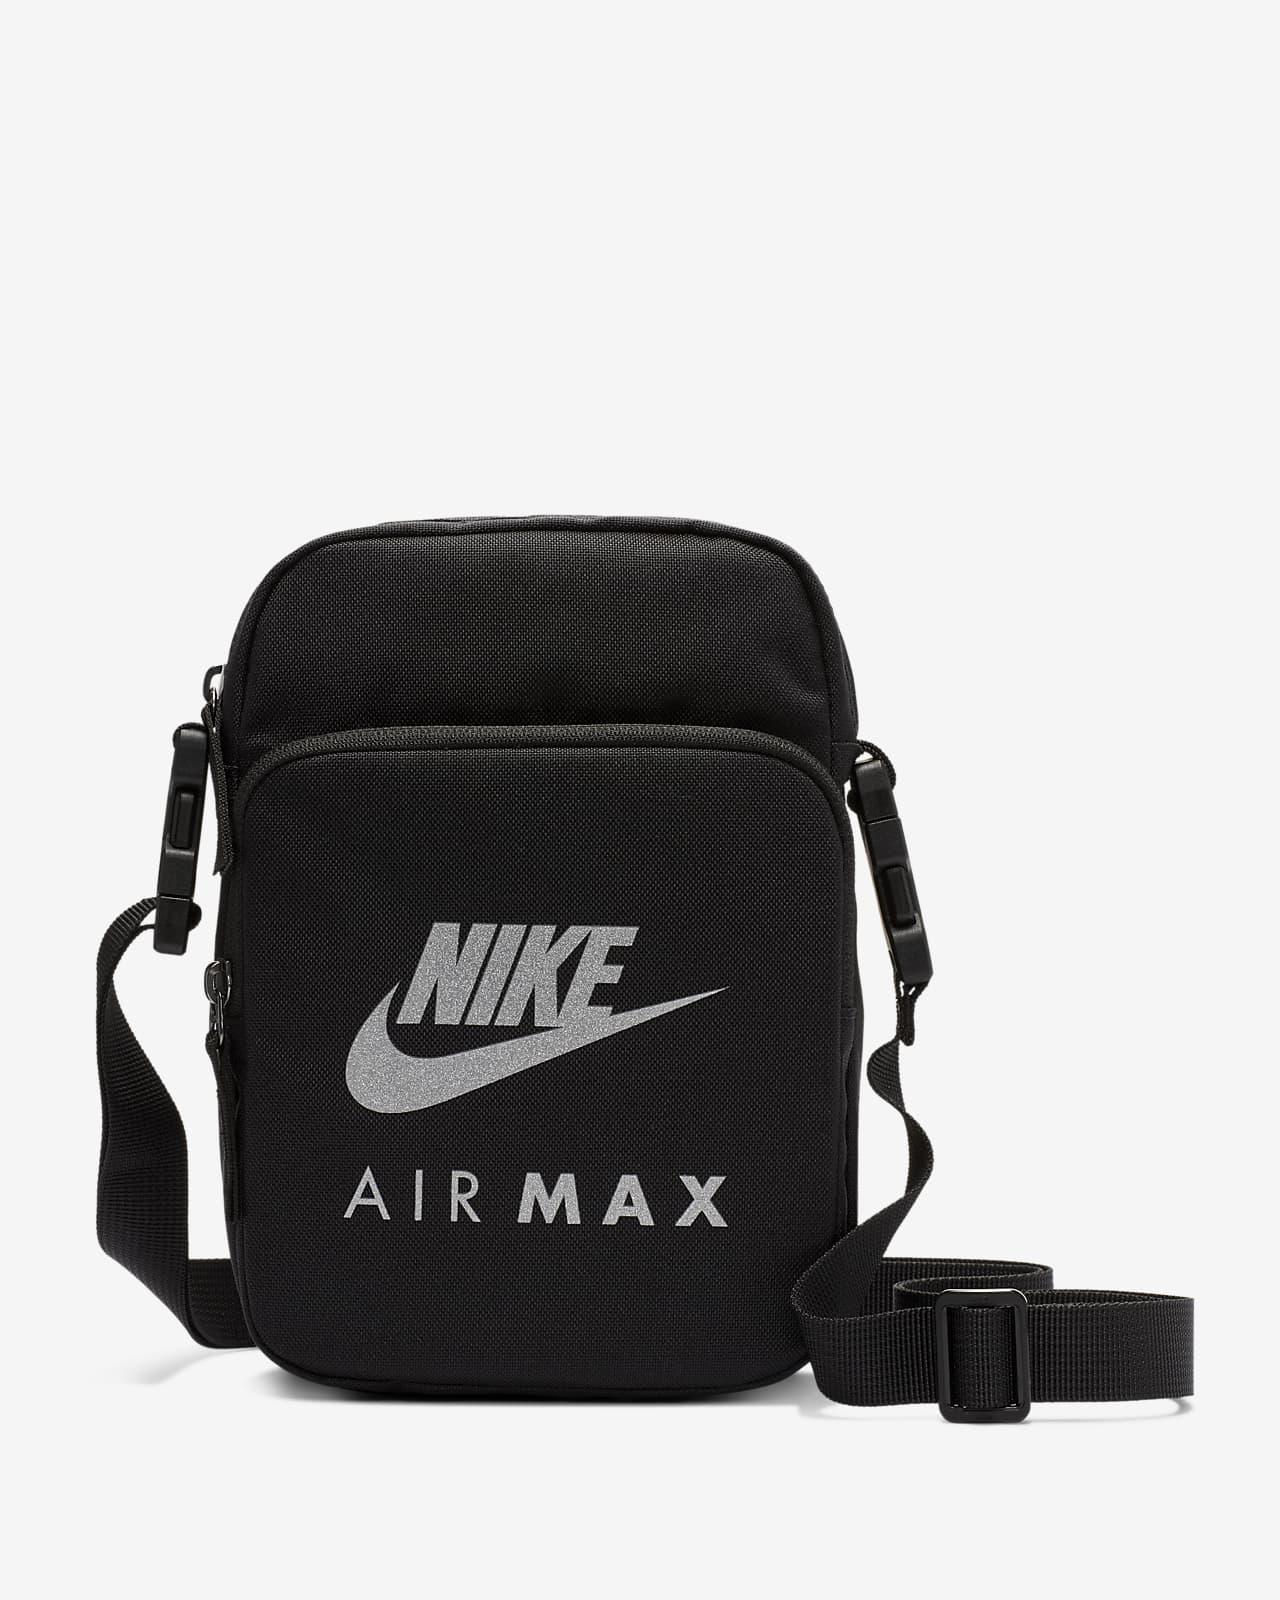 Sac à bandoulière Nike Air Max 2.0 (petite taille)